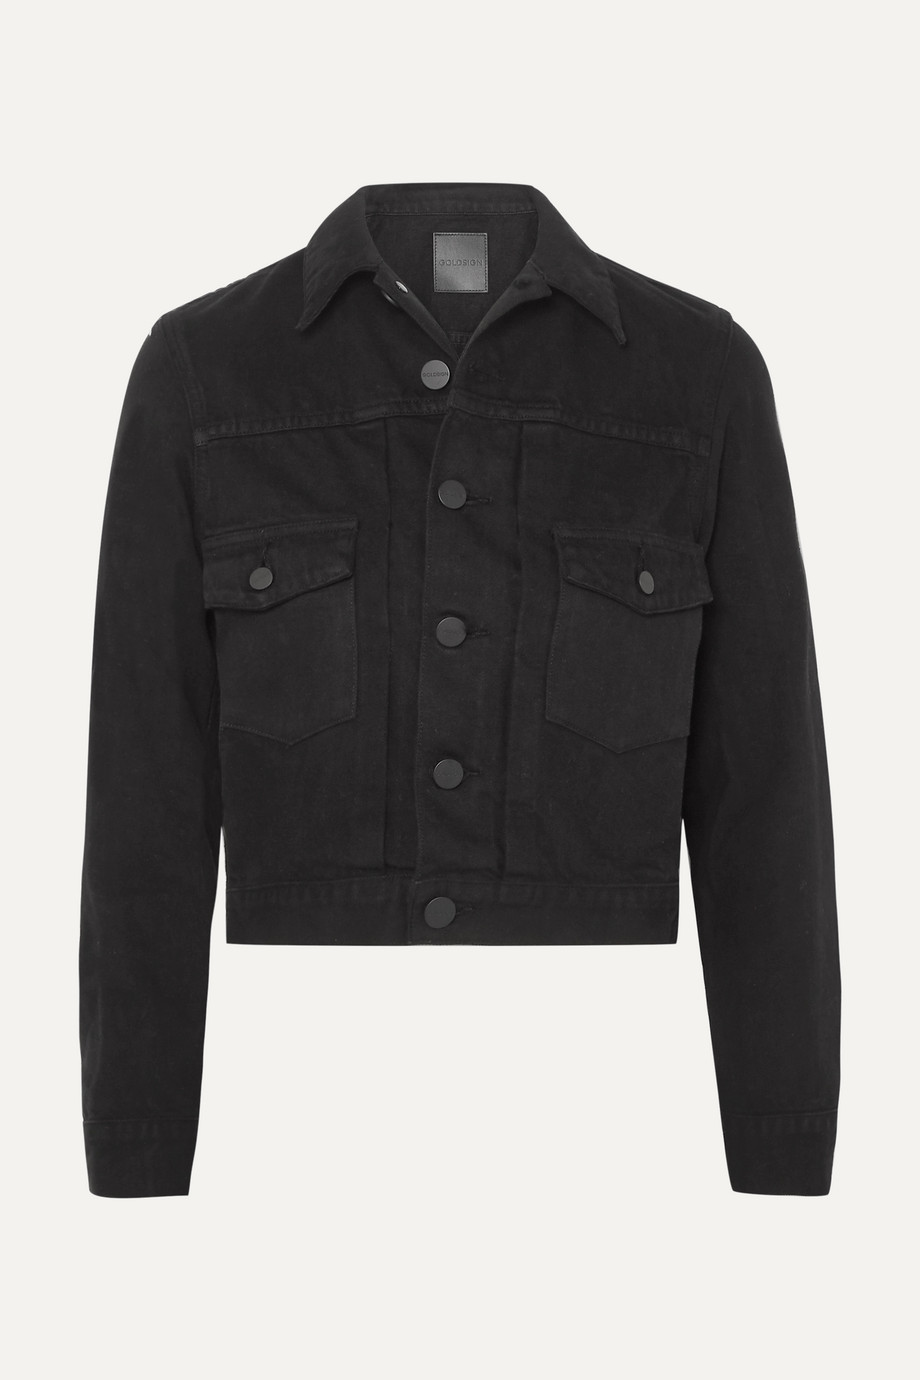 GOLDSIGN The Pleat denim jacket